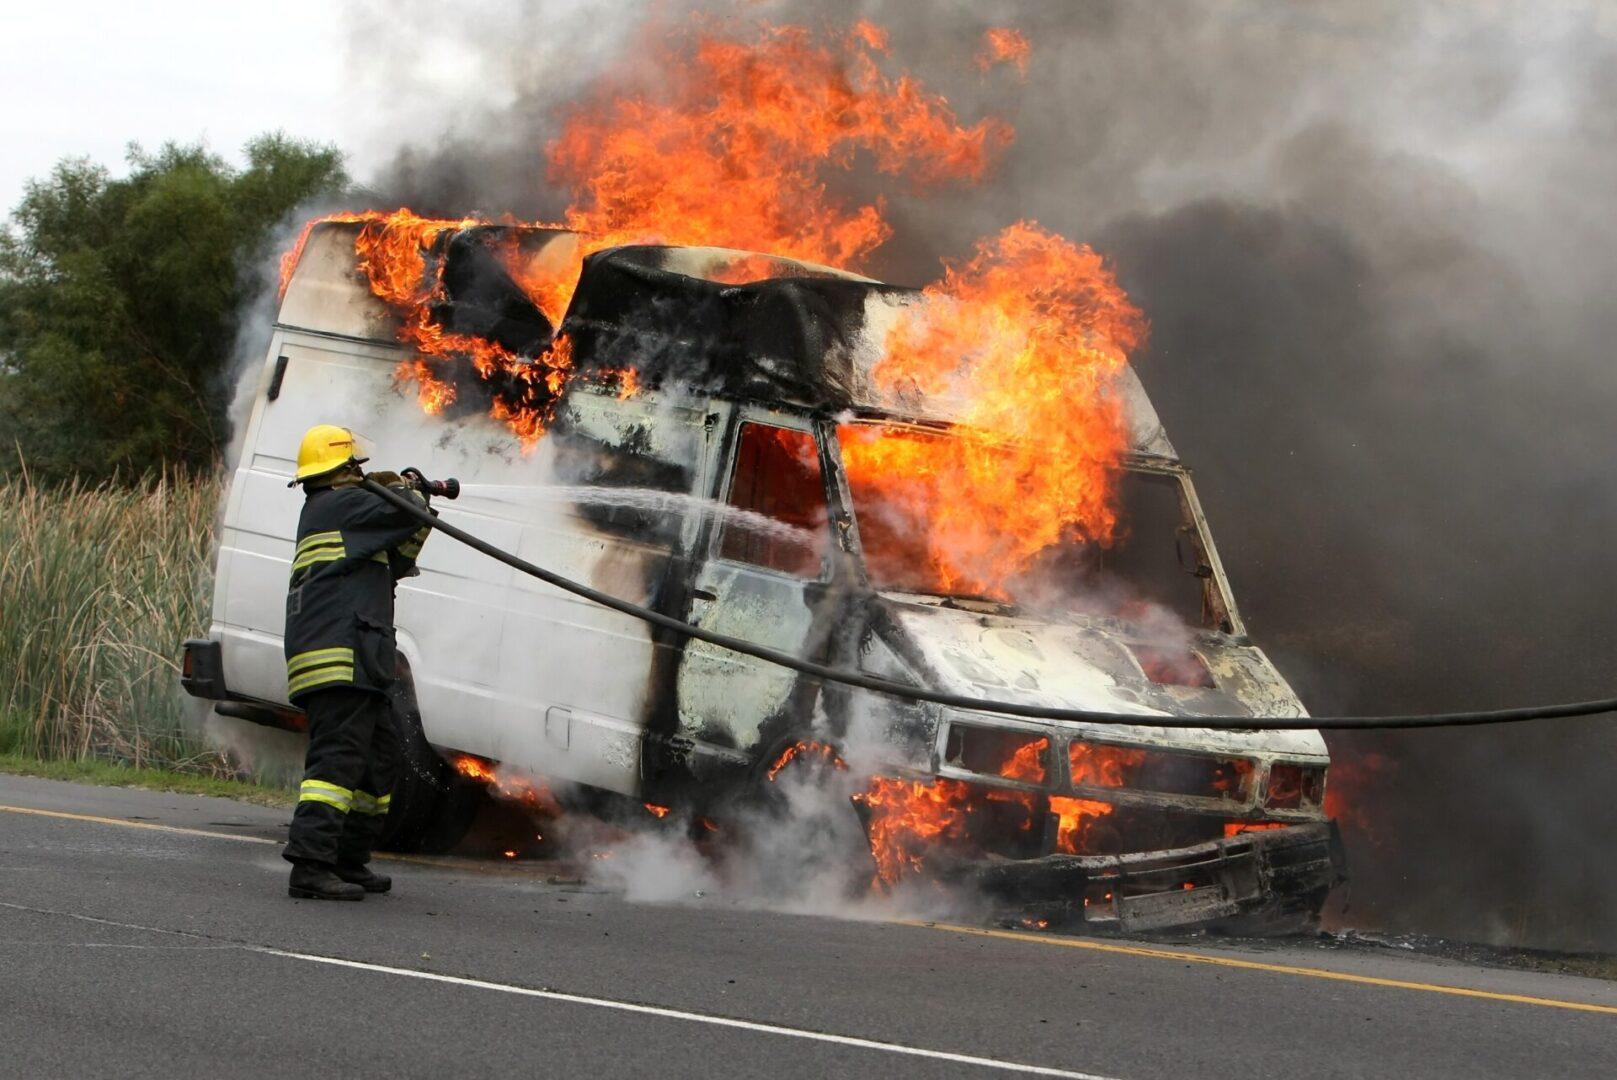 A fireman extinguishing a burning van